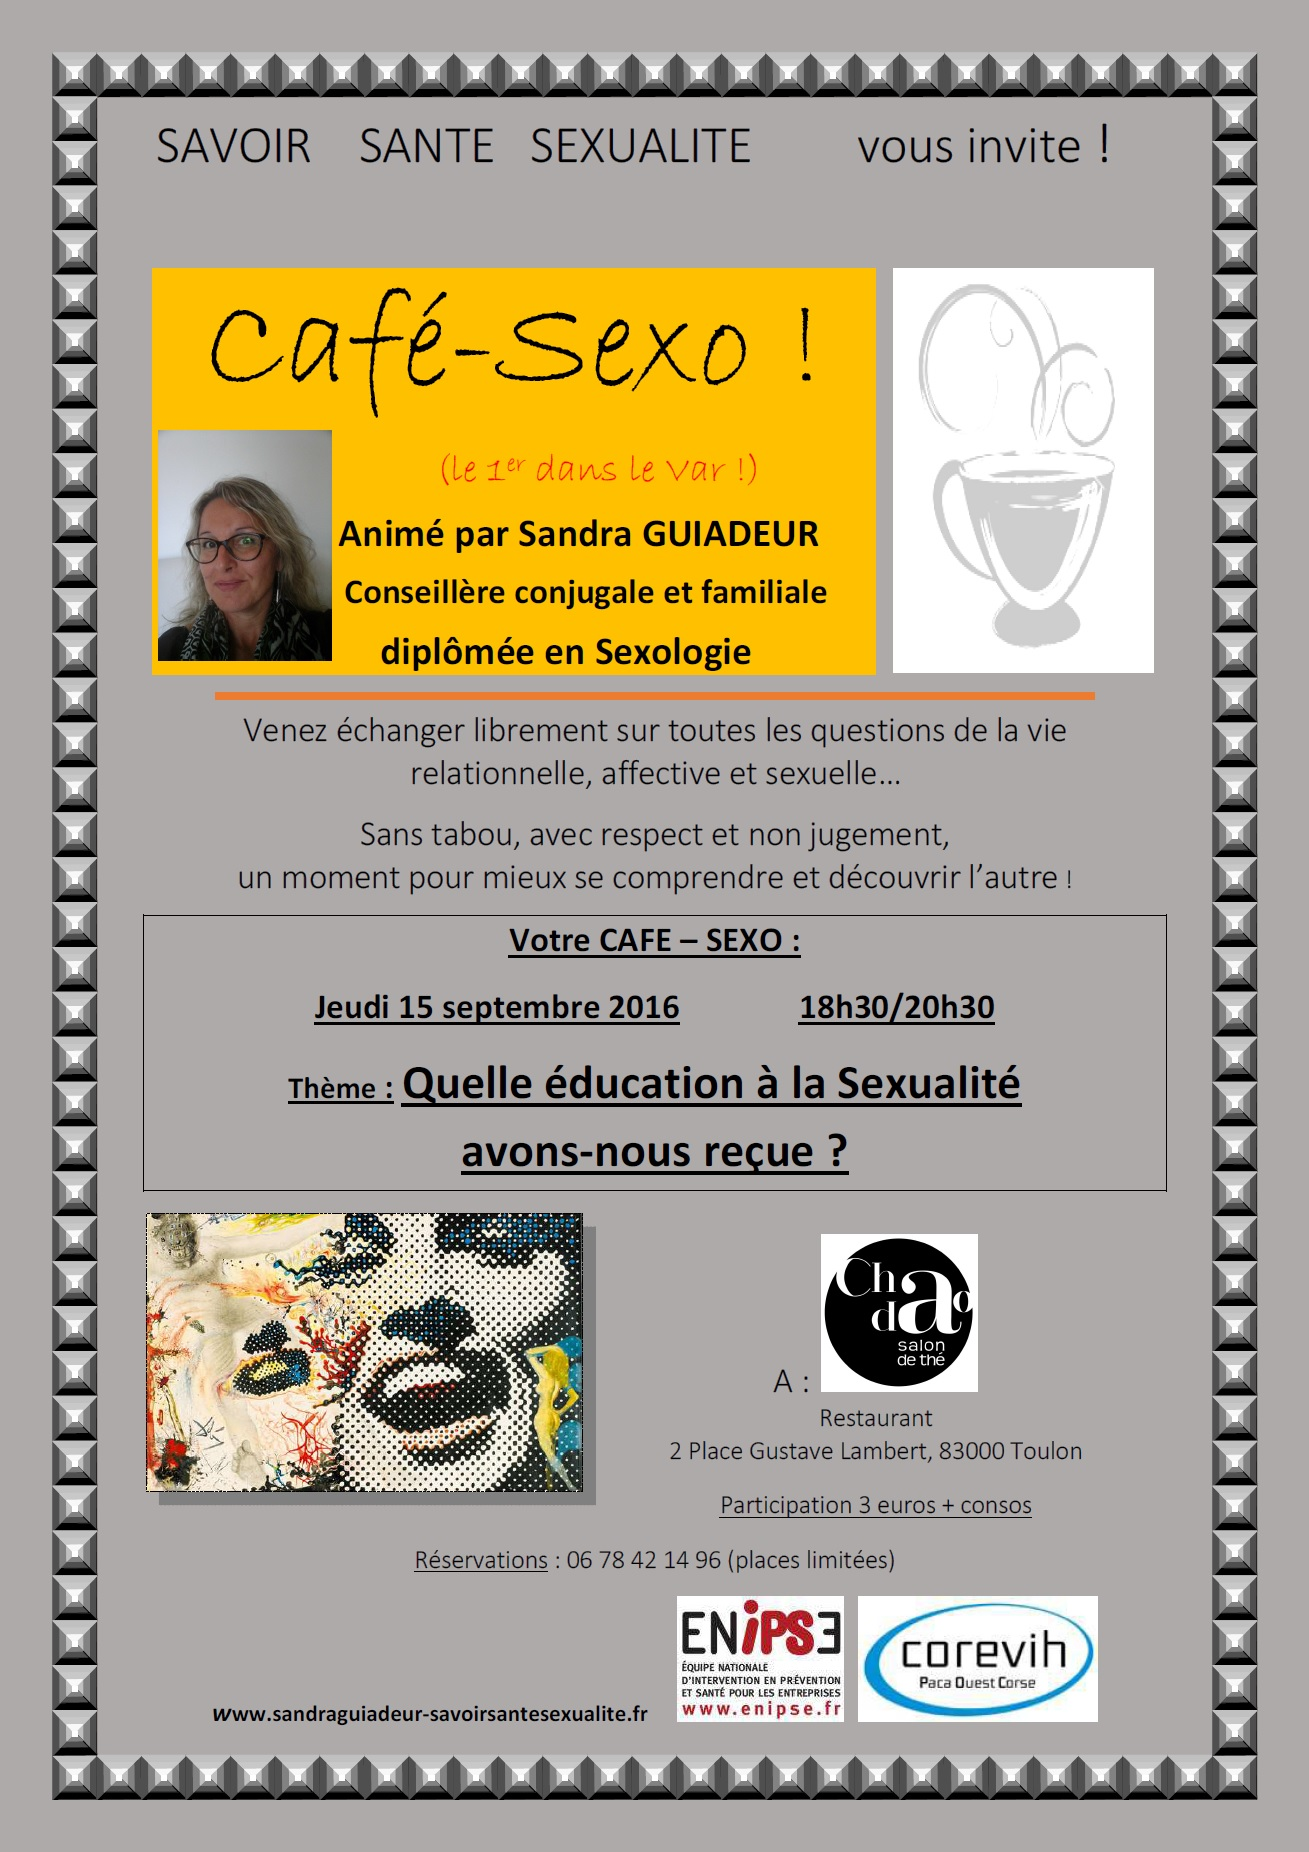 Affiche cafe sexo savoir sante sexualite 2016 09 15